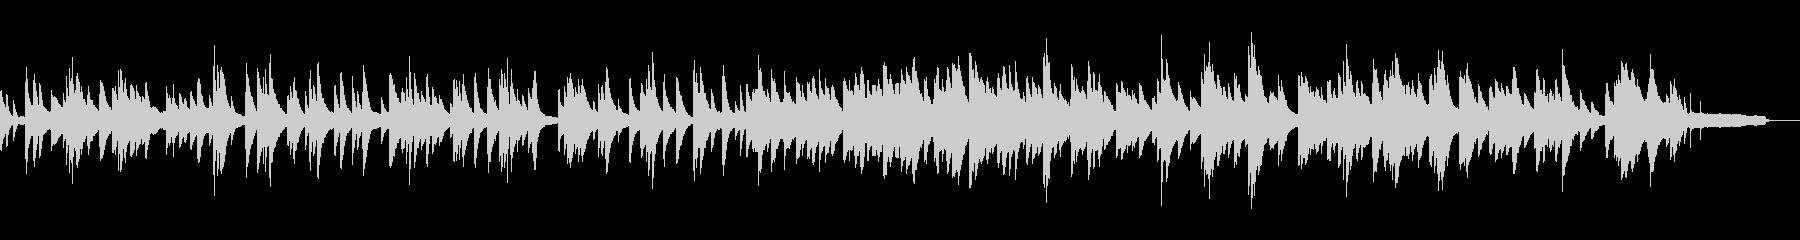 Cinematic Piano 6の未再生の波形